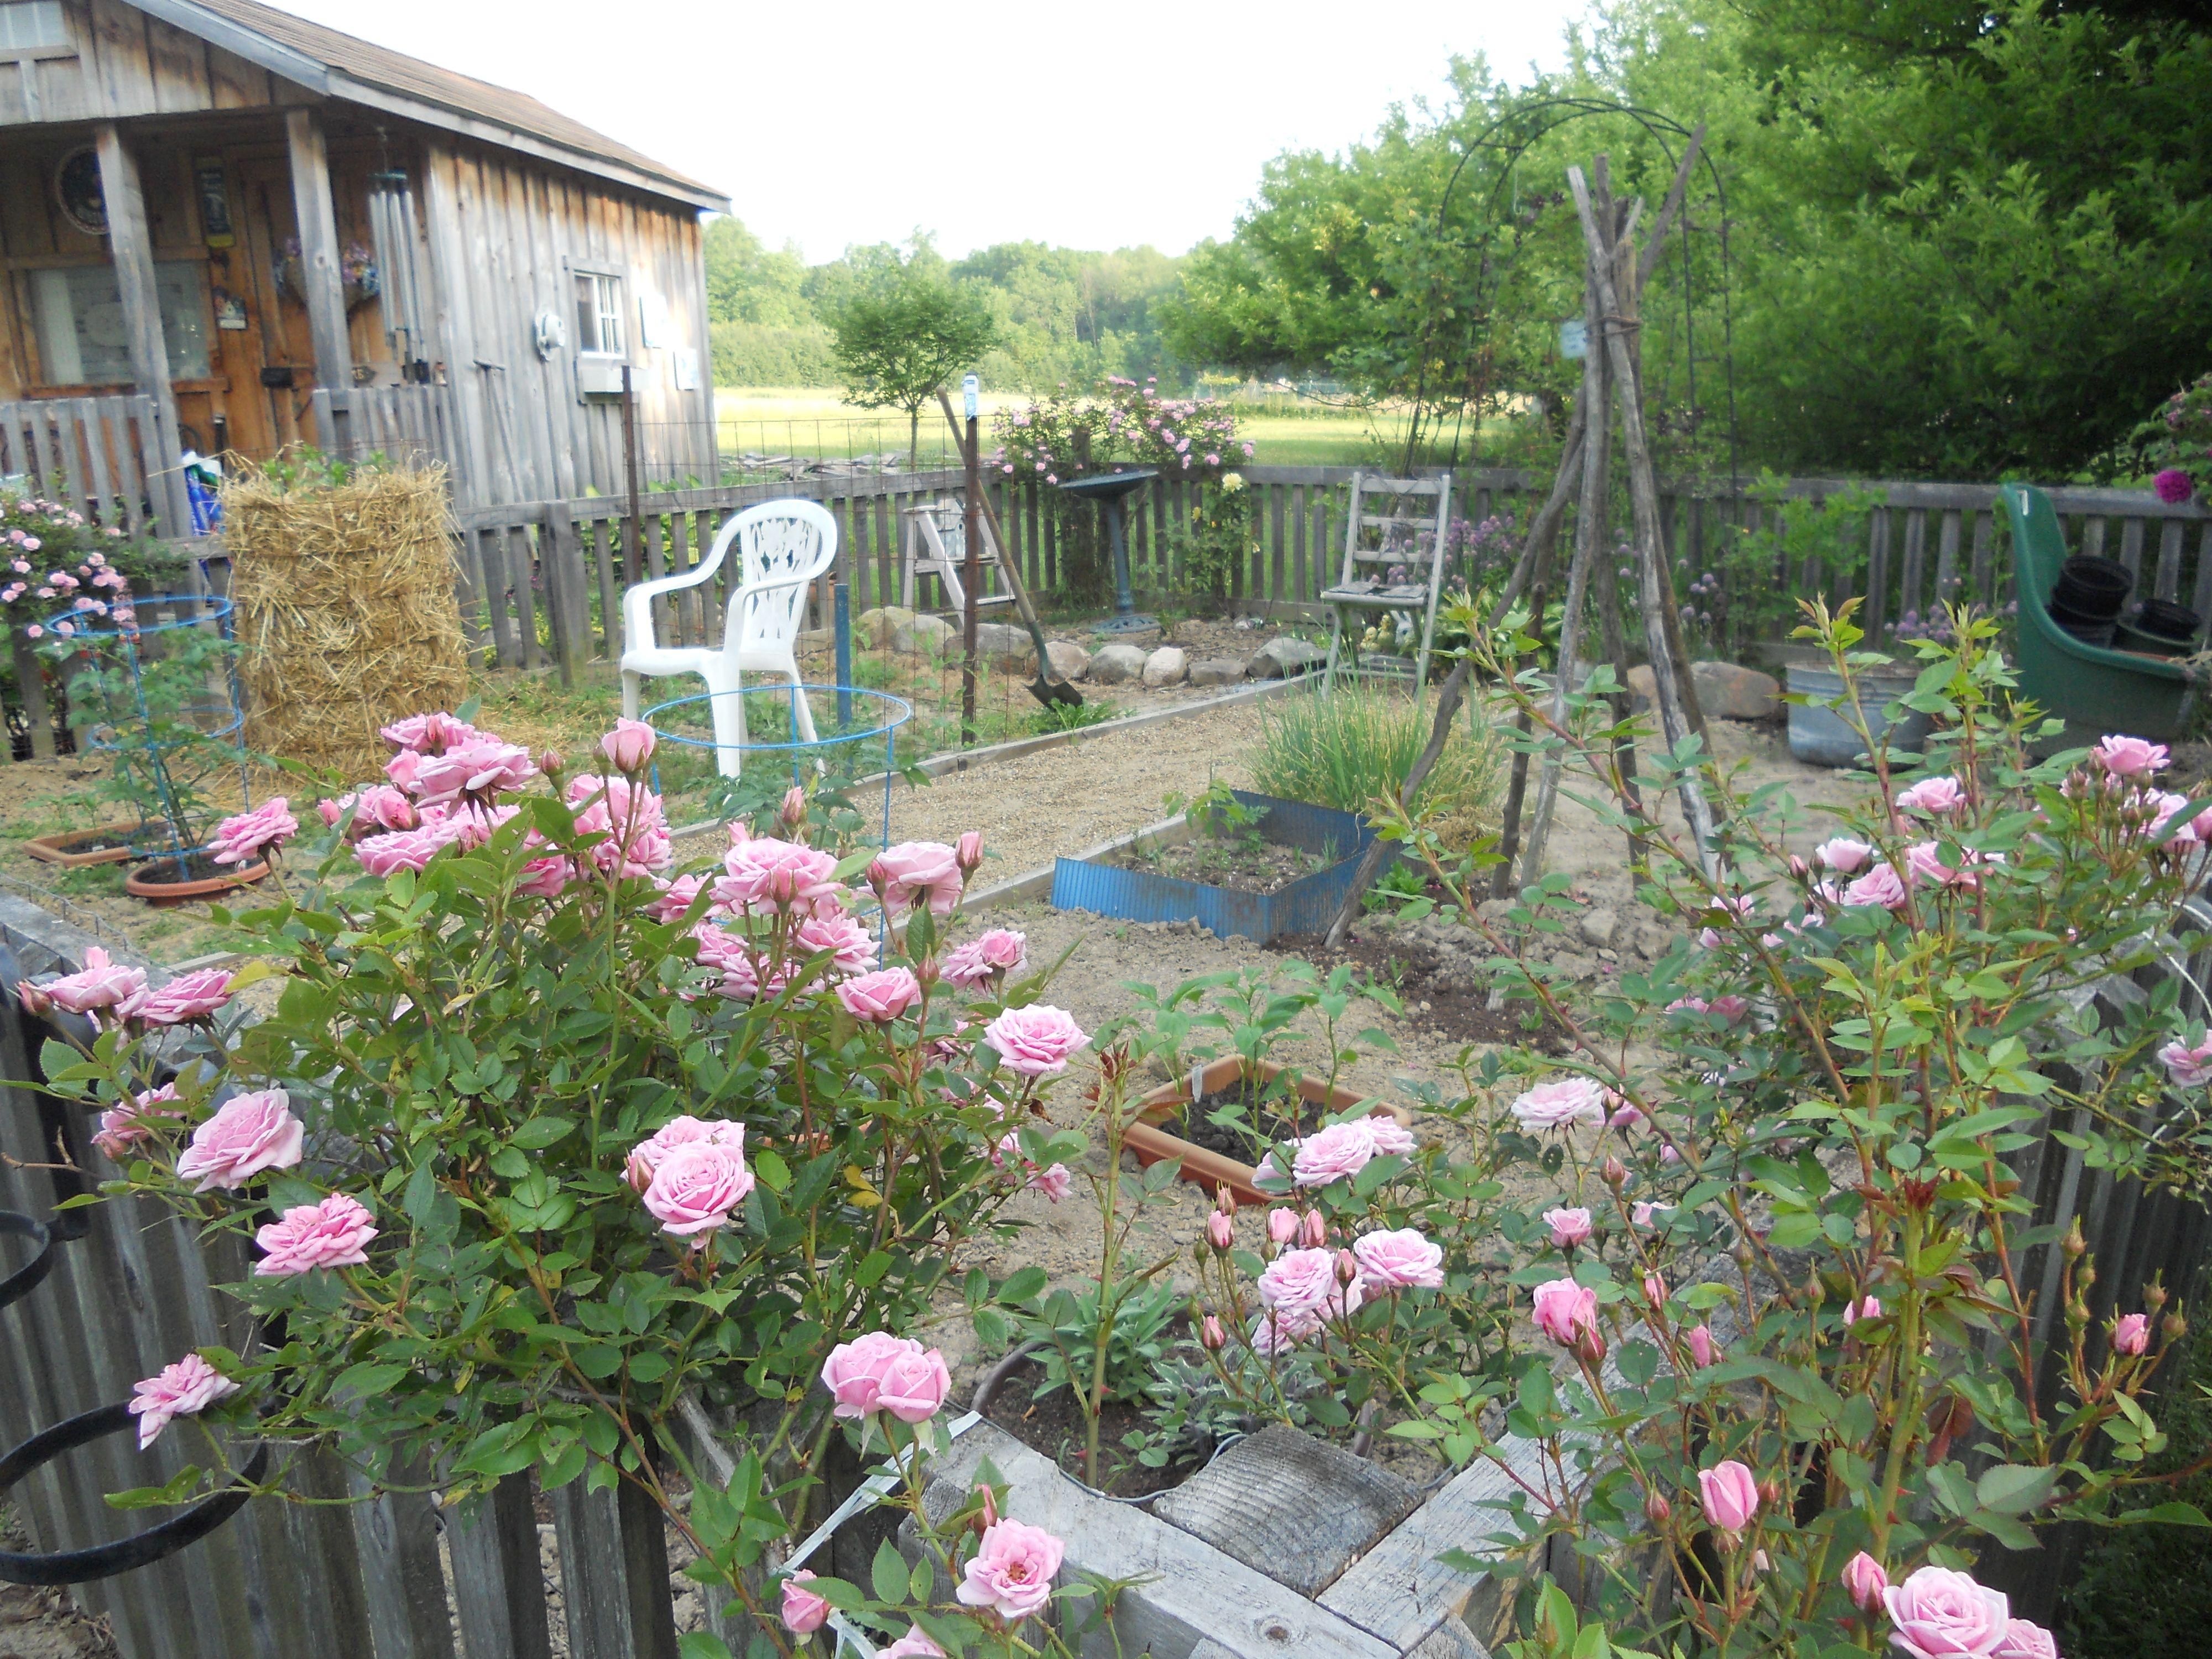 my garden this year has sunken pots and a potato tower garden